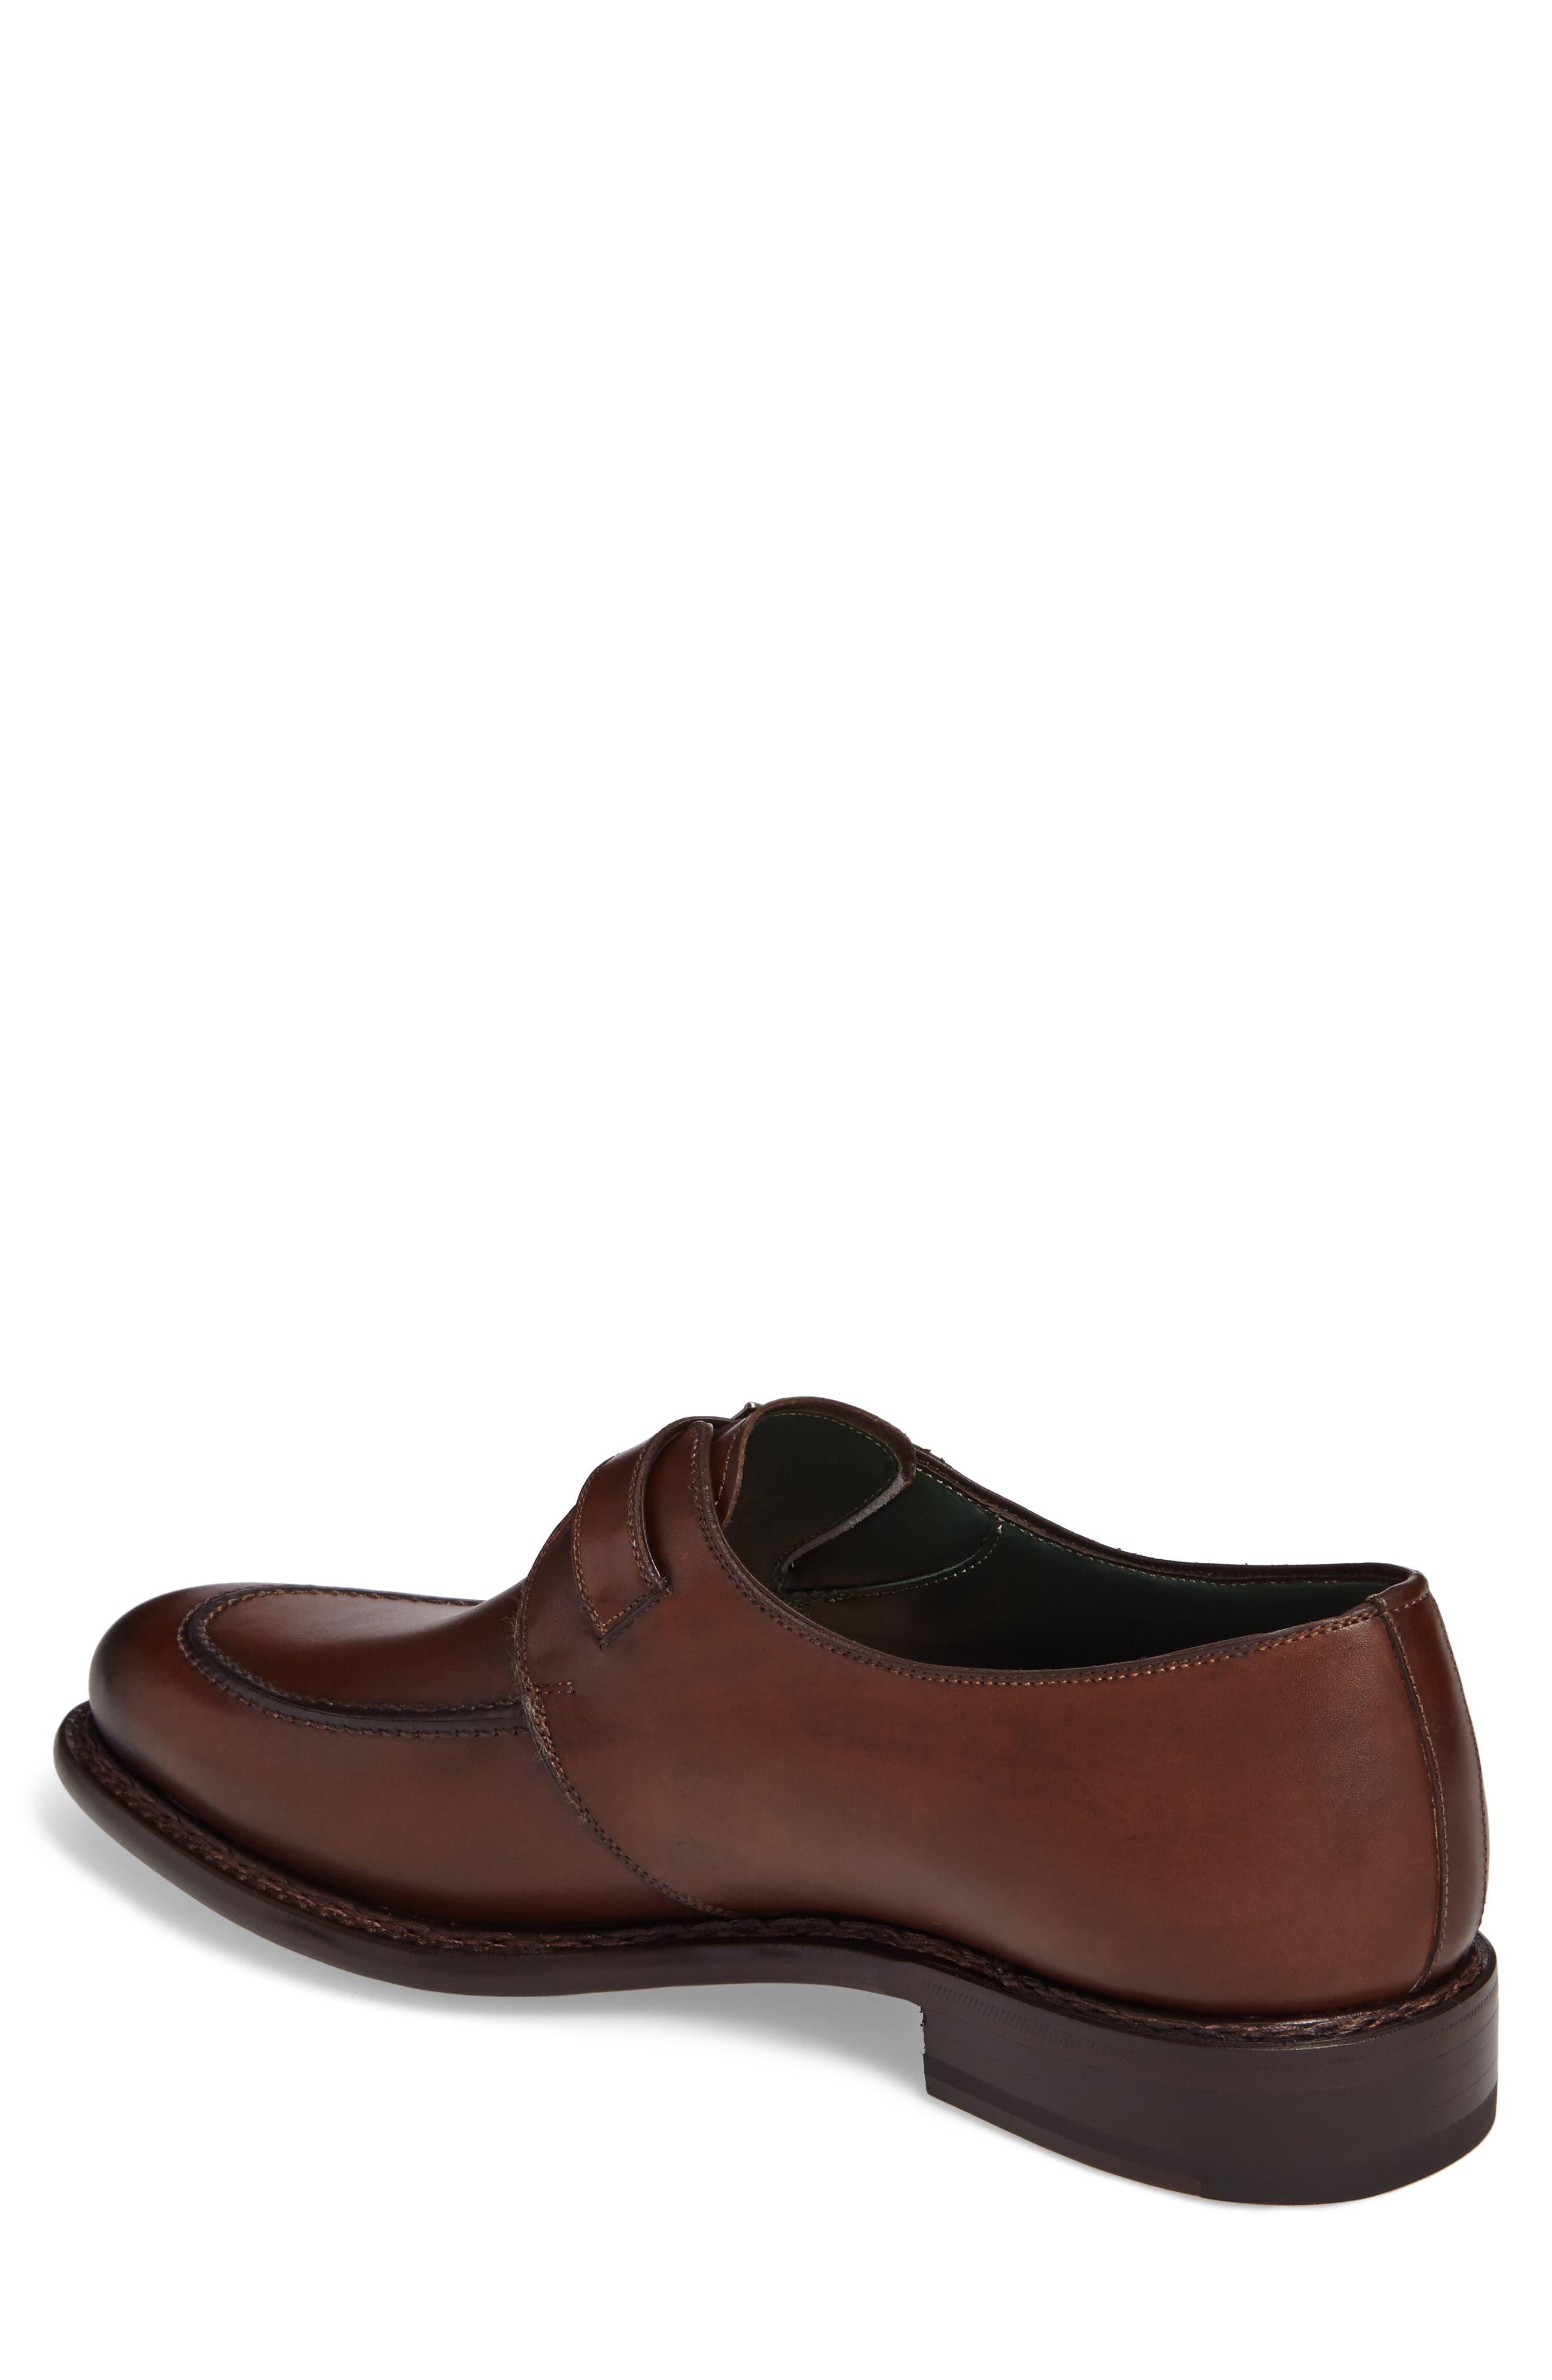 Alternate Image 2  - Mezlan Aguilar Monk Strap Shoe (Men)